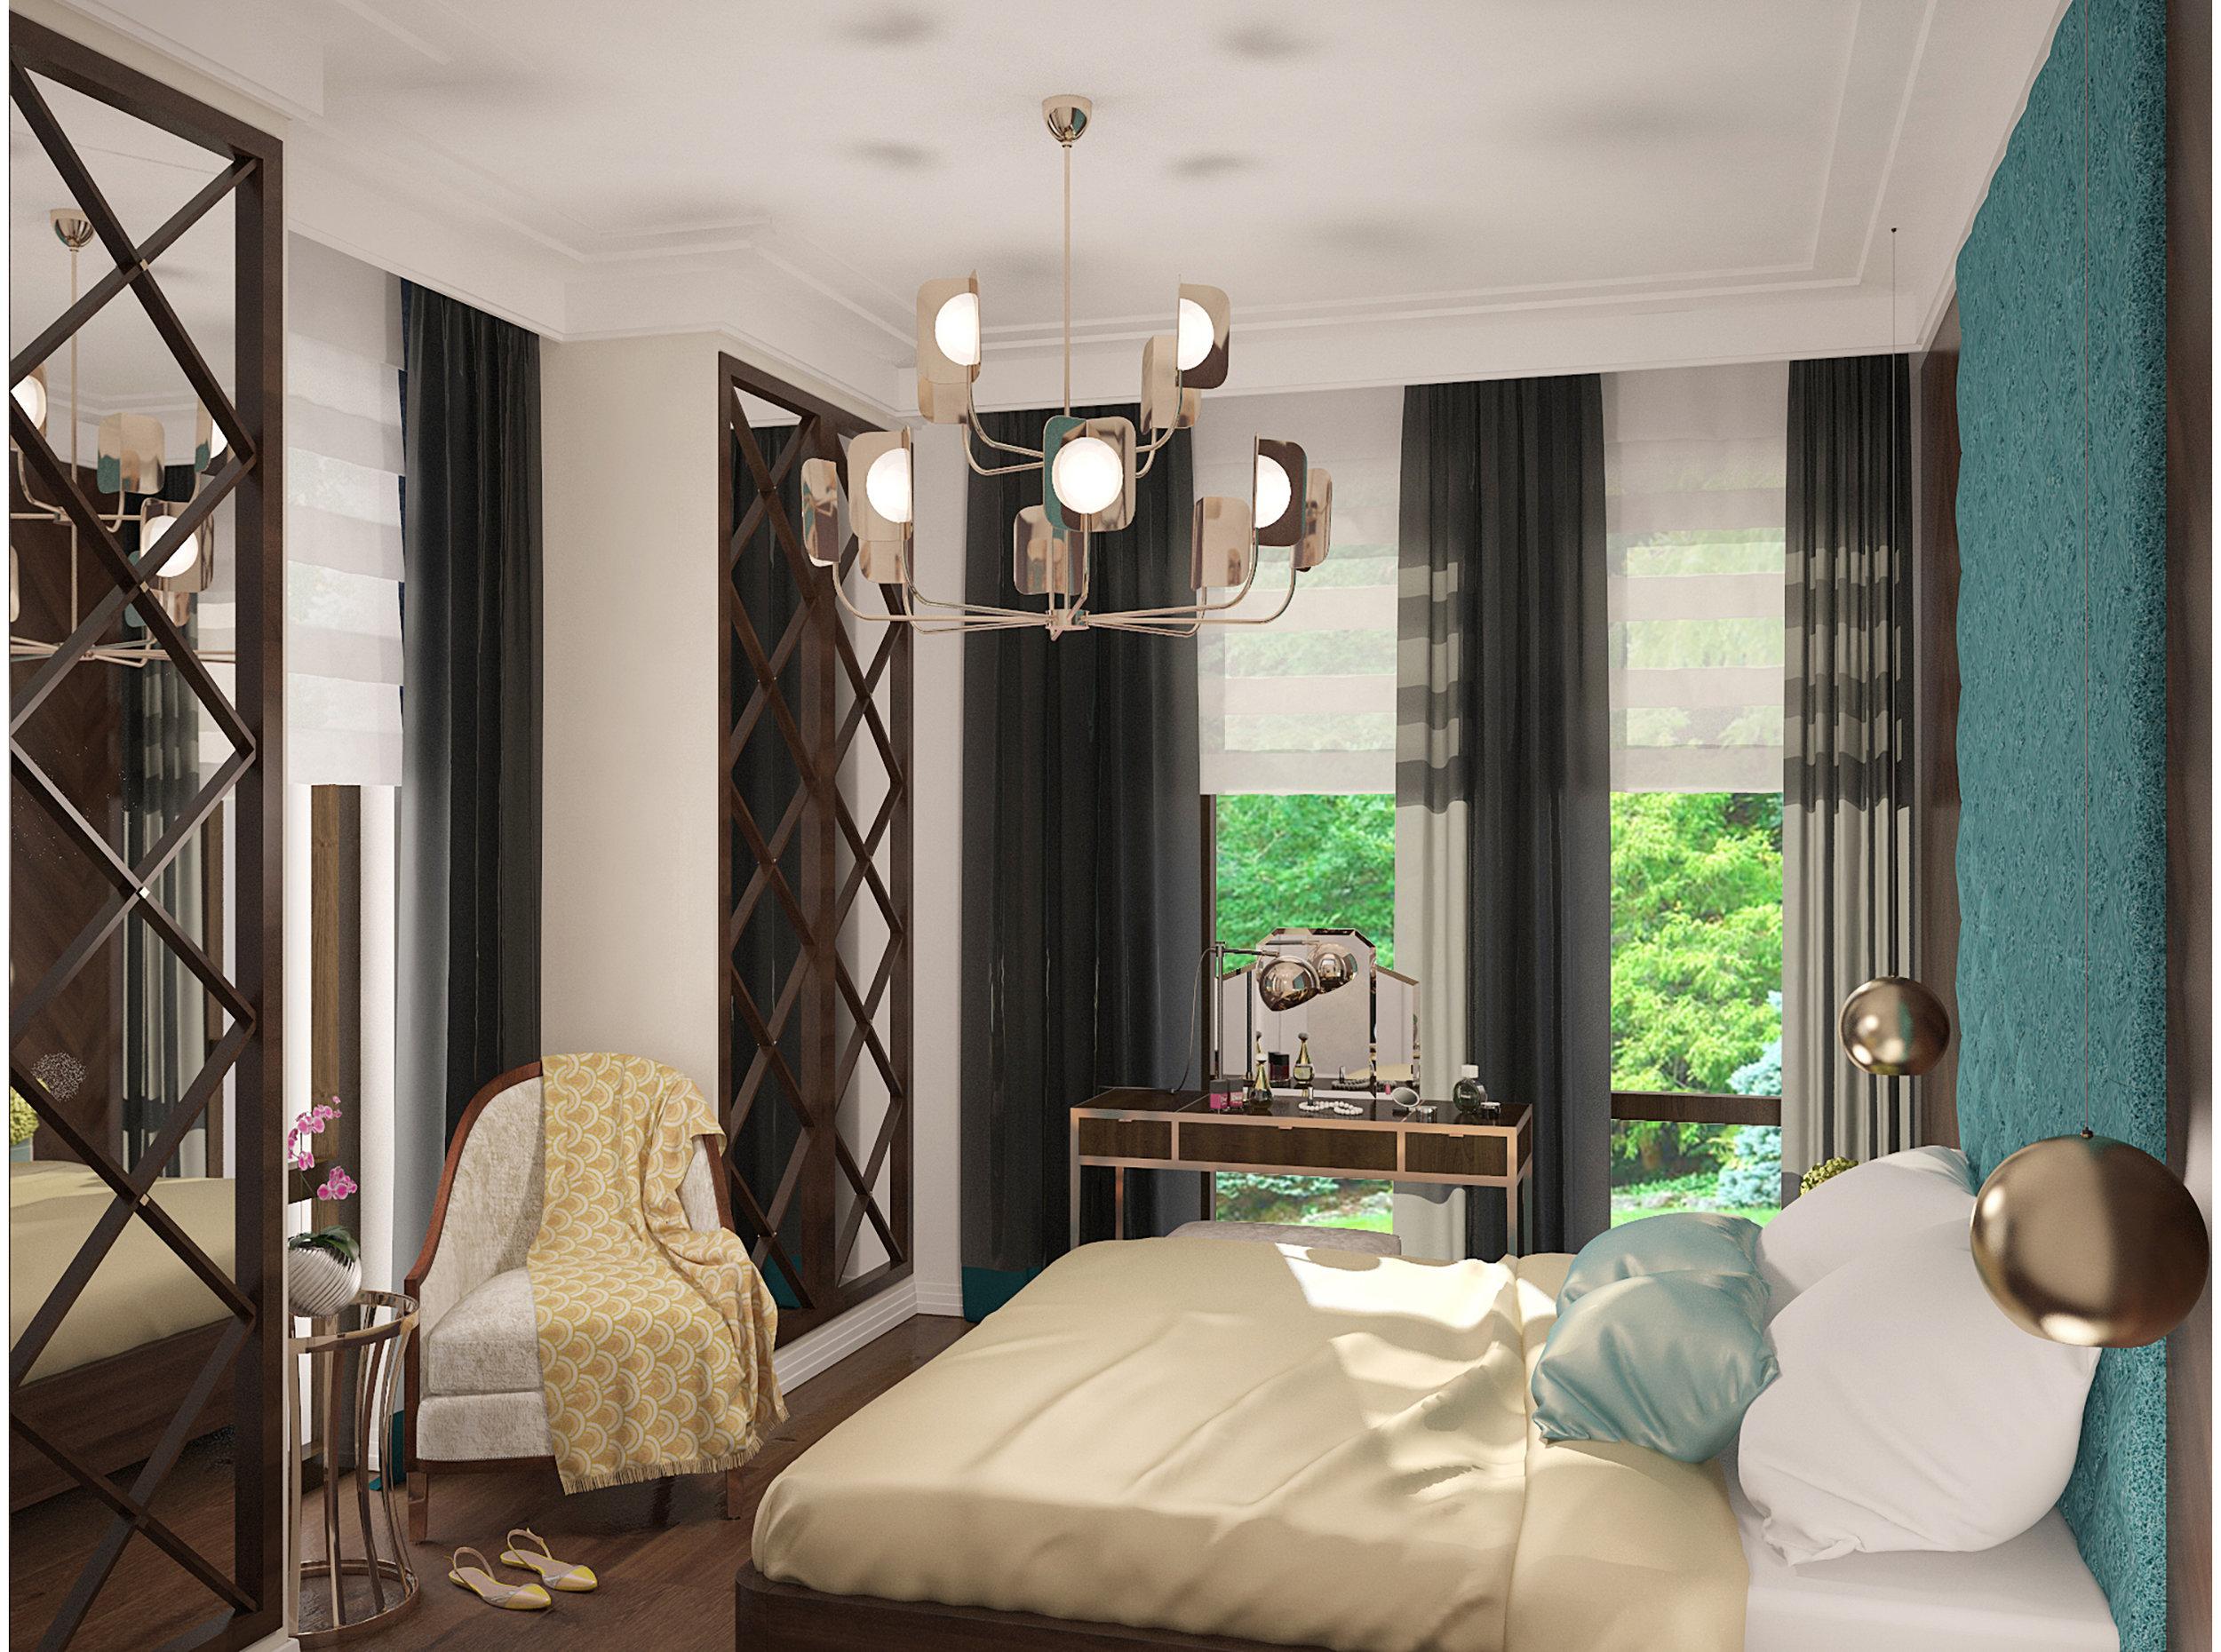 Copy of Bedroom art deco style interior